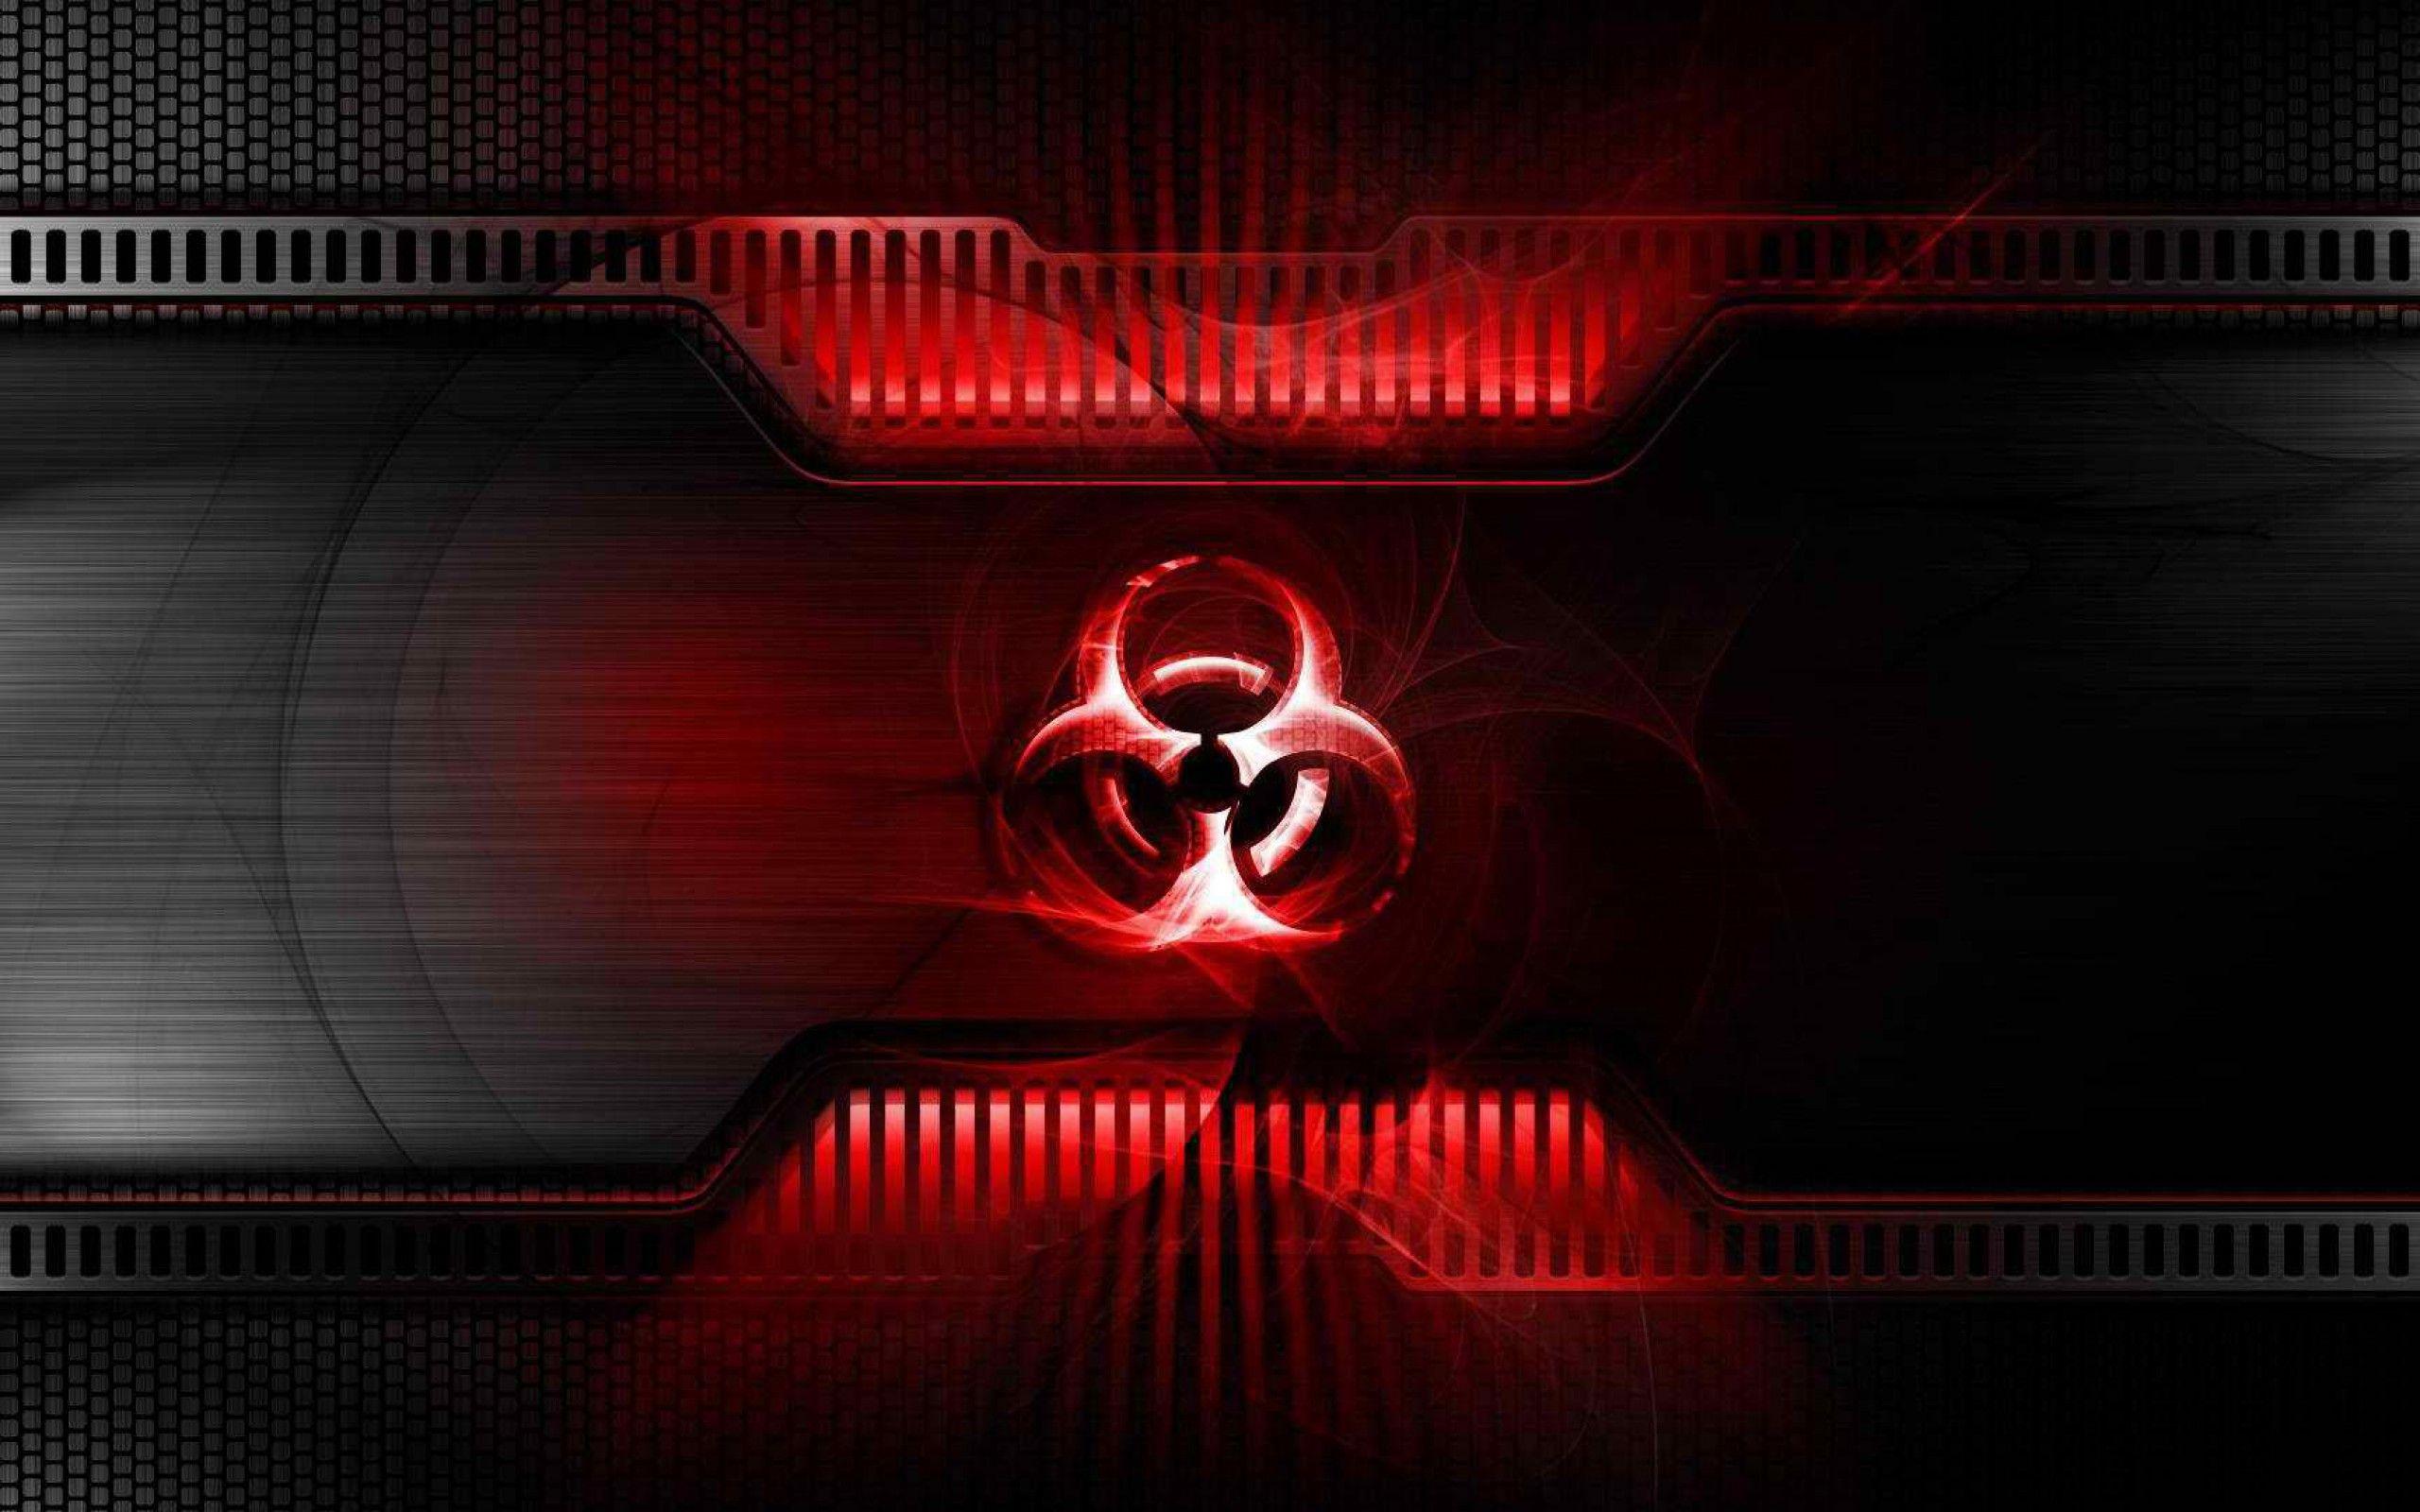 Free Widescreen Wallpaper Fall Biohazard Symbol Hd Wallpaper Pixelstalk Net